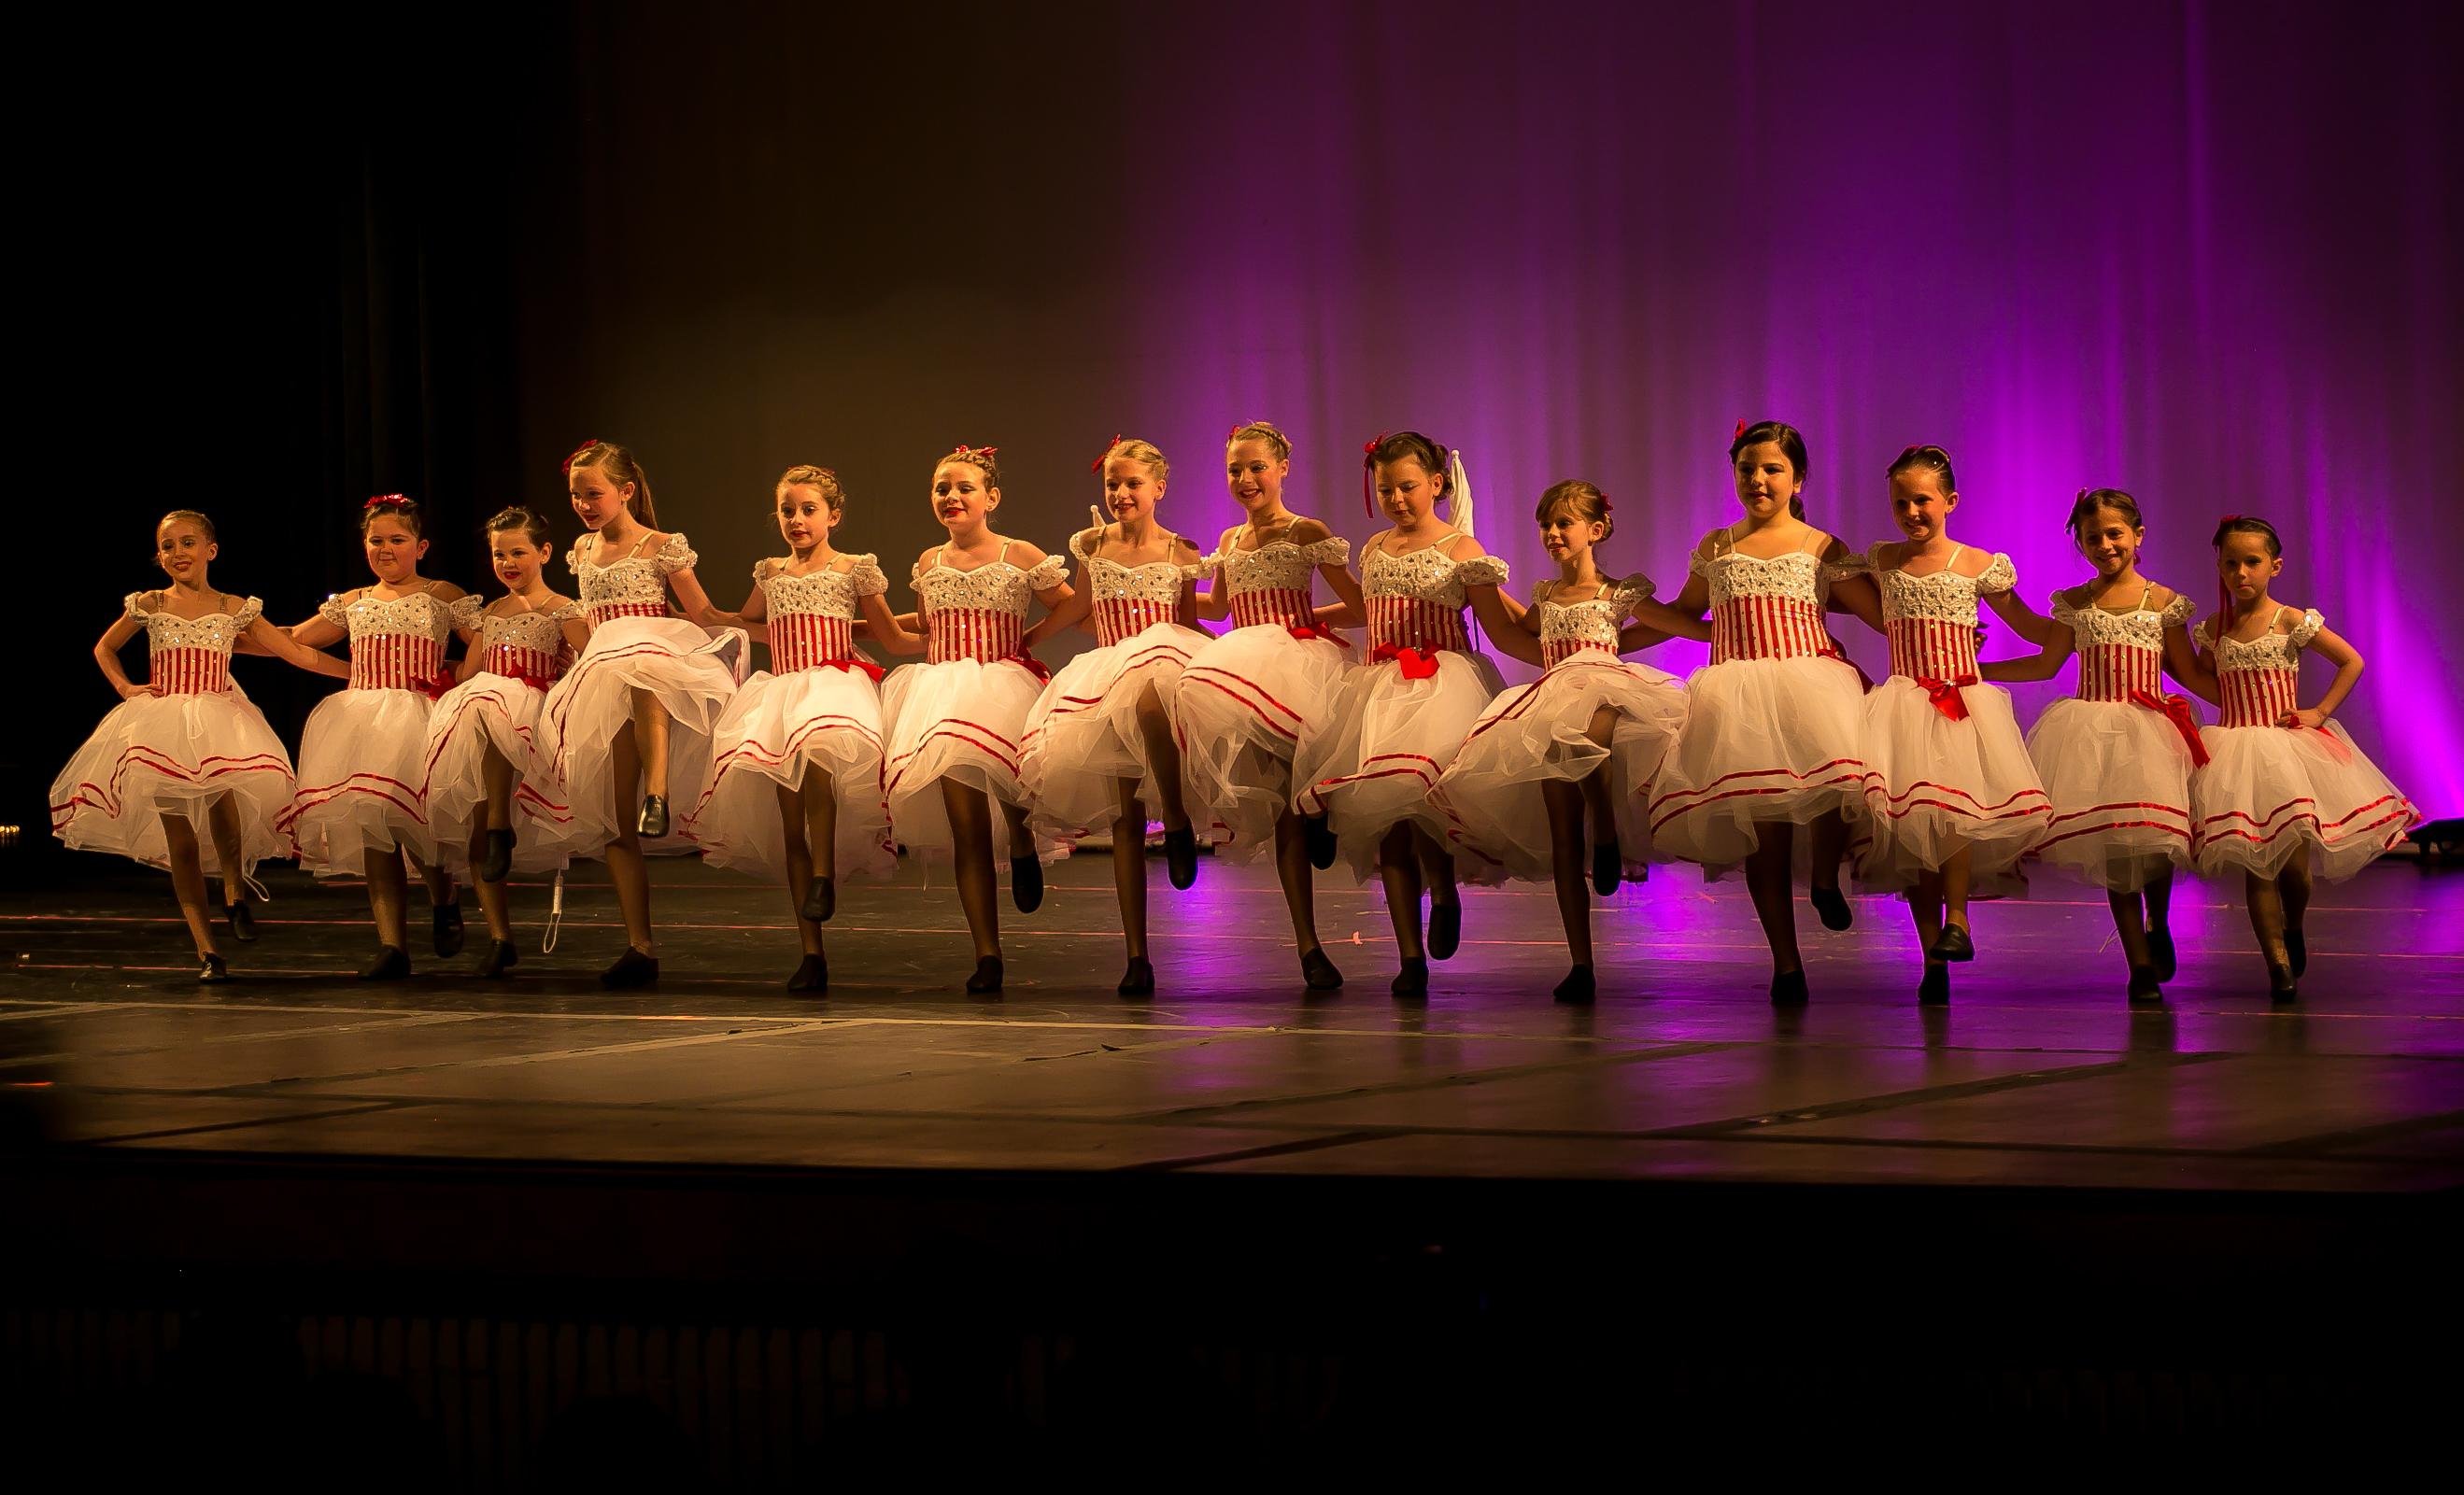 dance photos (can can girls)